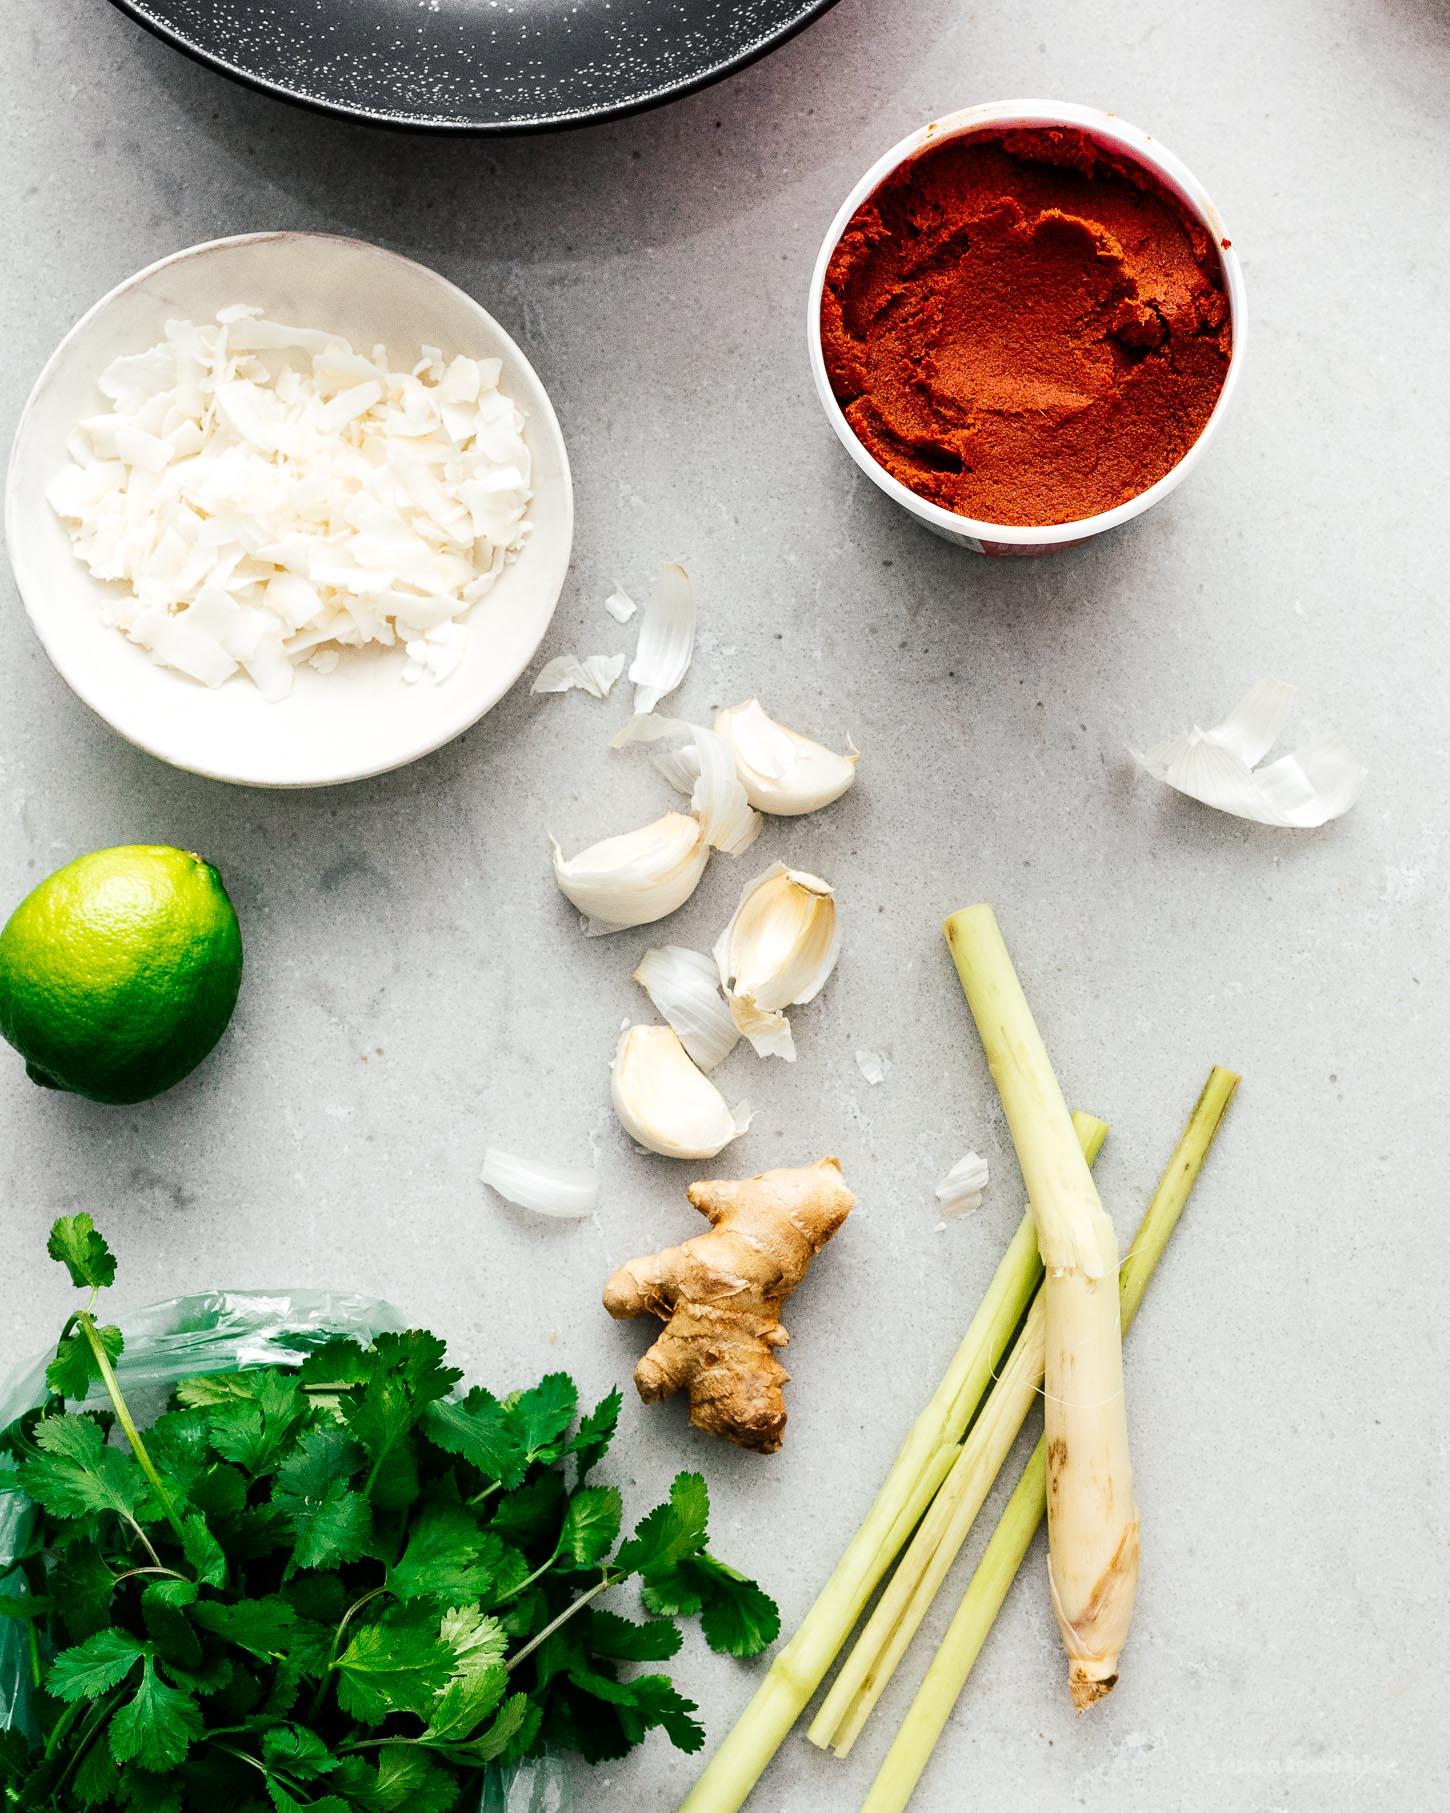 Easy Weeknight Coconut Curry Braised Chicken Legs Recipe | www.iamafoodblog.com